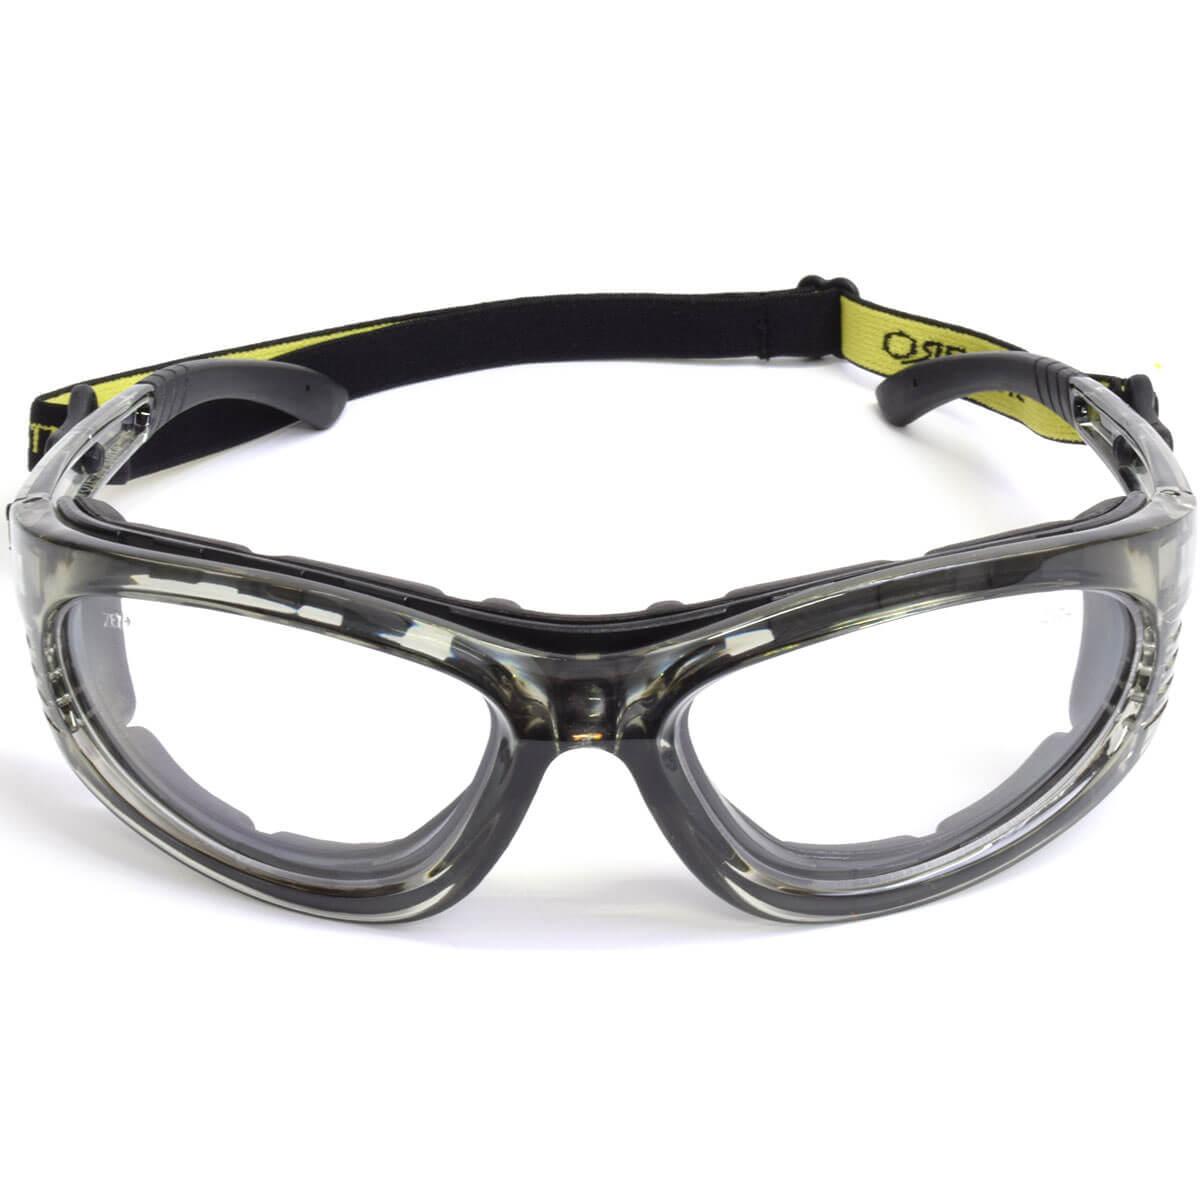 befeb7fdc7e0d Óculos de Segurança Lente Incolor Turbine Steelpro VIC58110 Vicsa